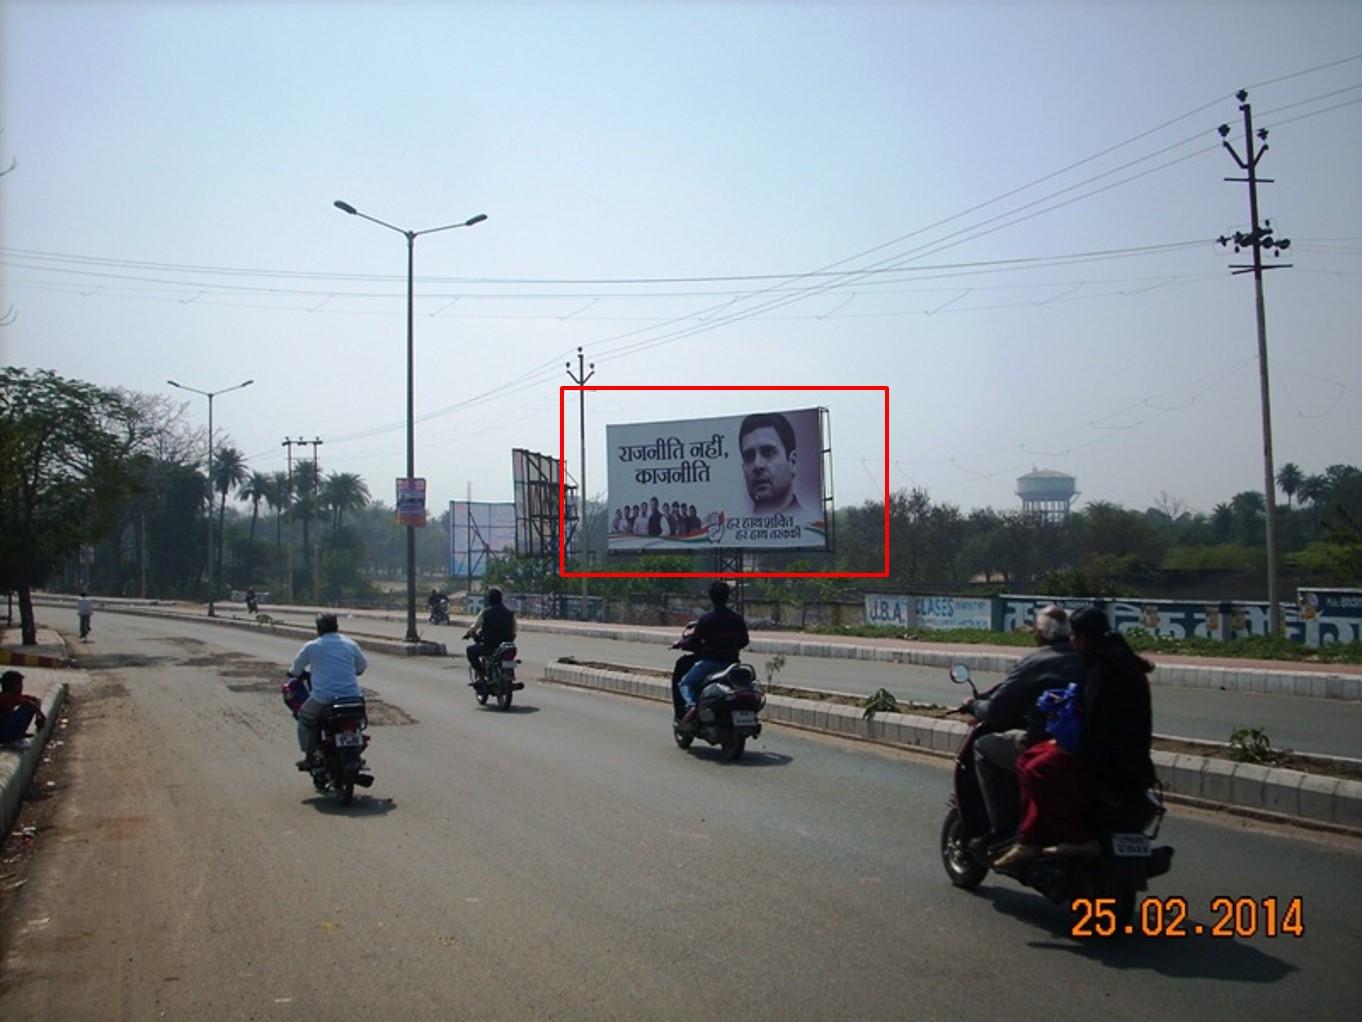 Gwalior Road, Near Polytechnic, Jhansi